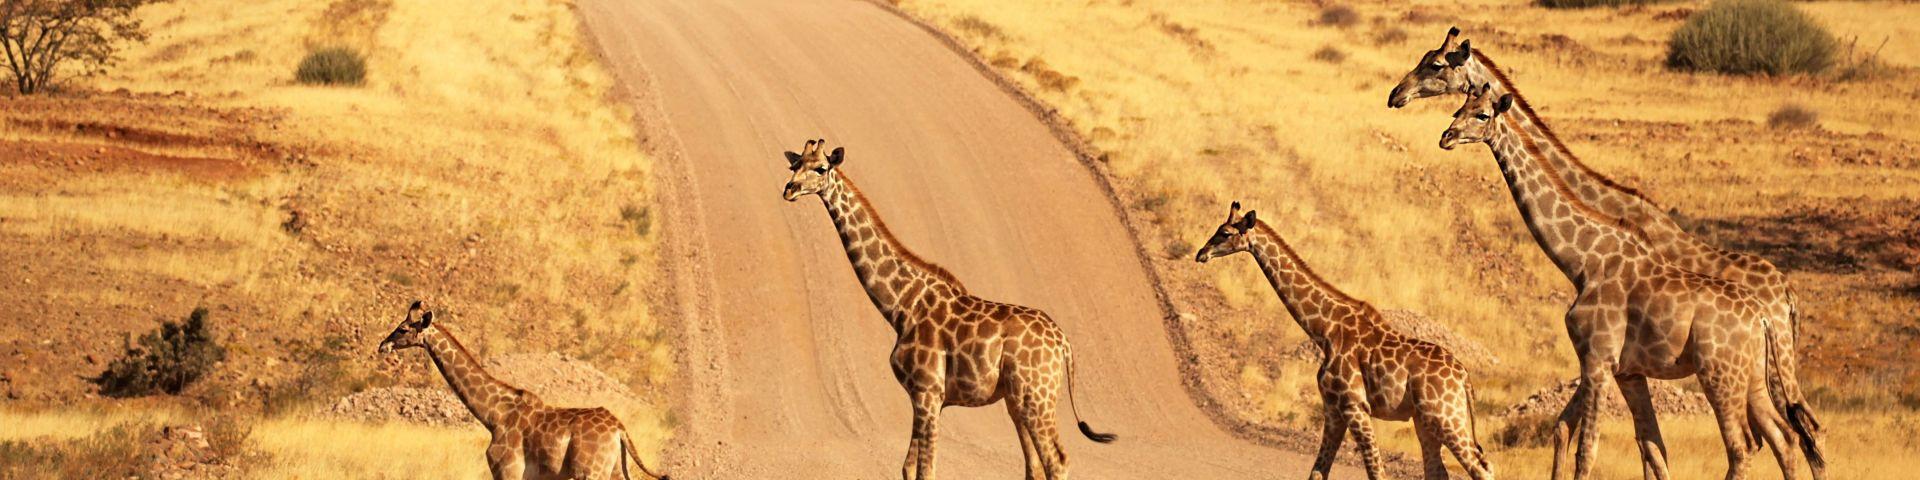 Hakuna Matata - Sorgenfrei durch Namibia